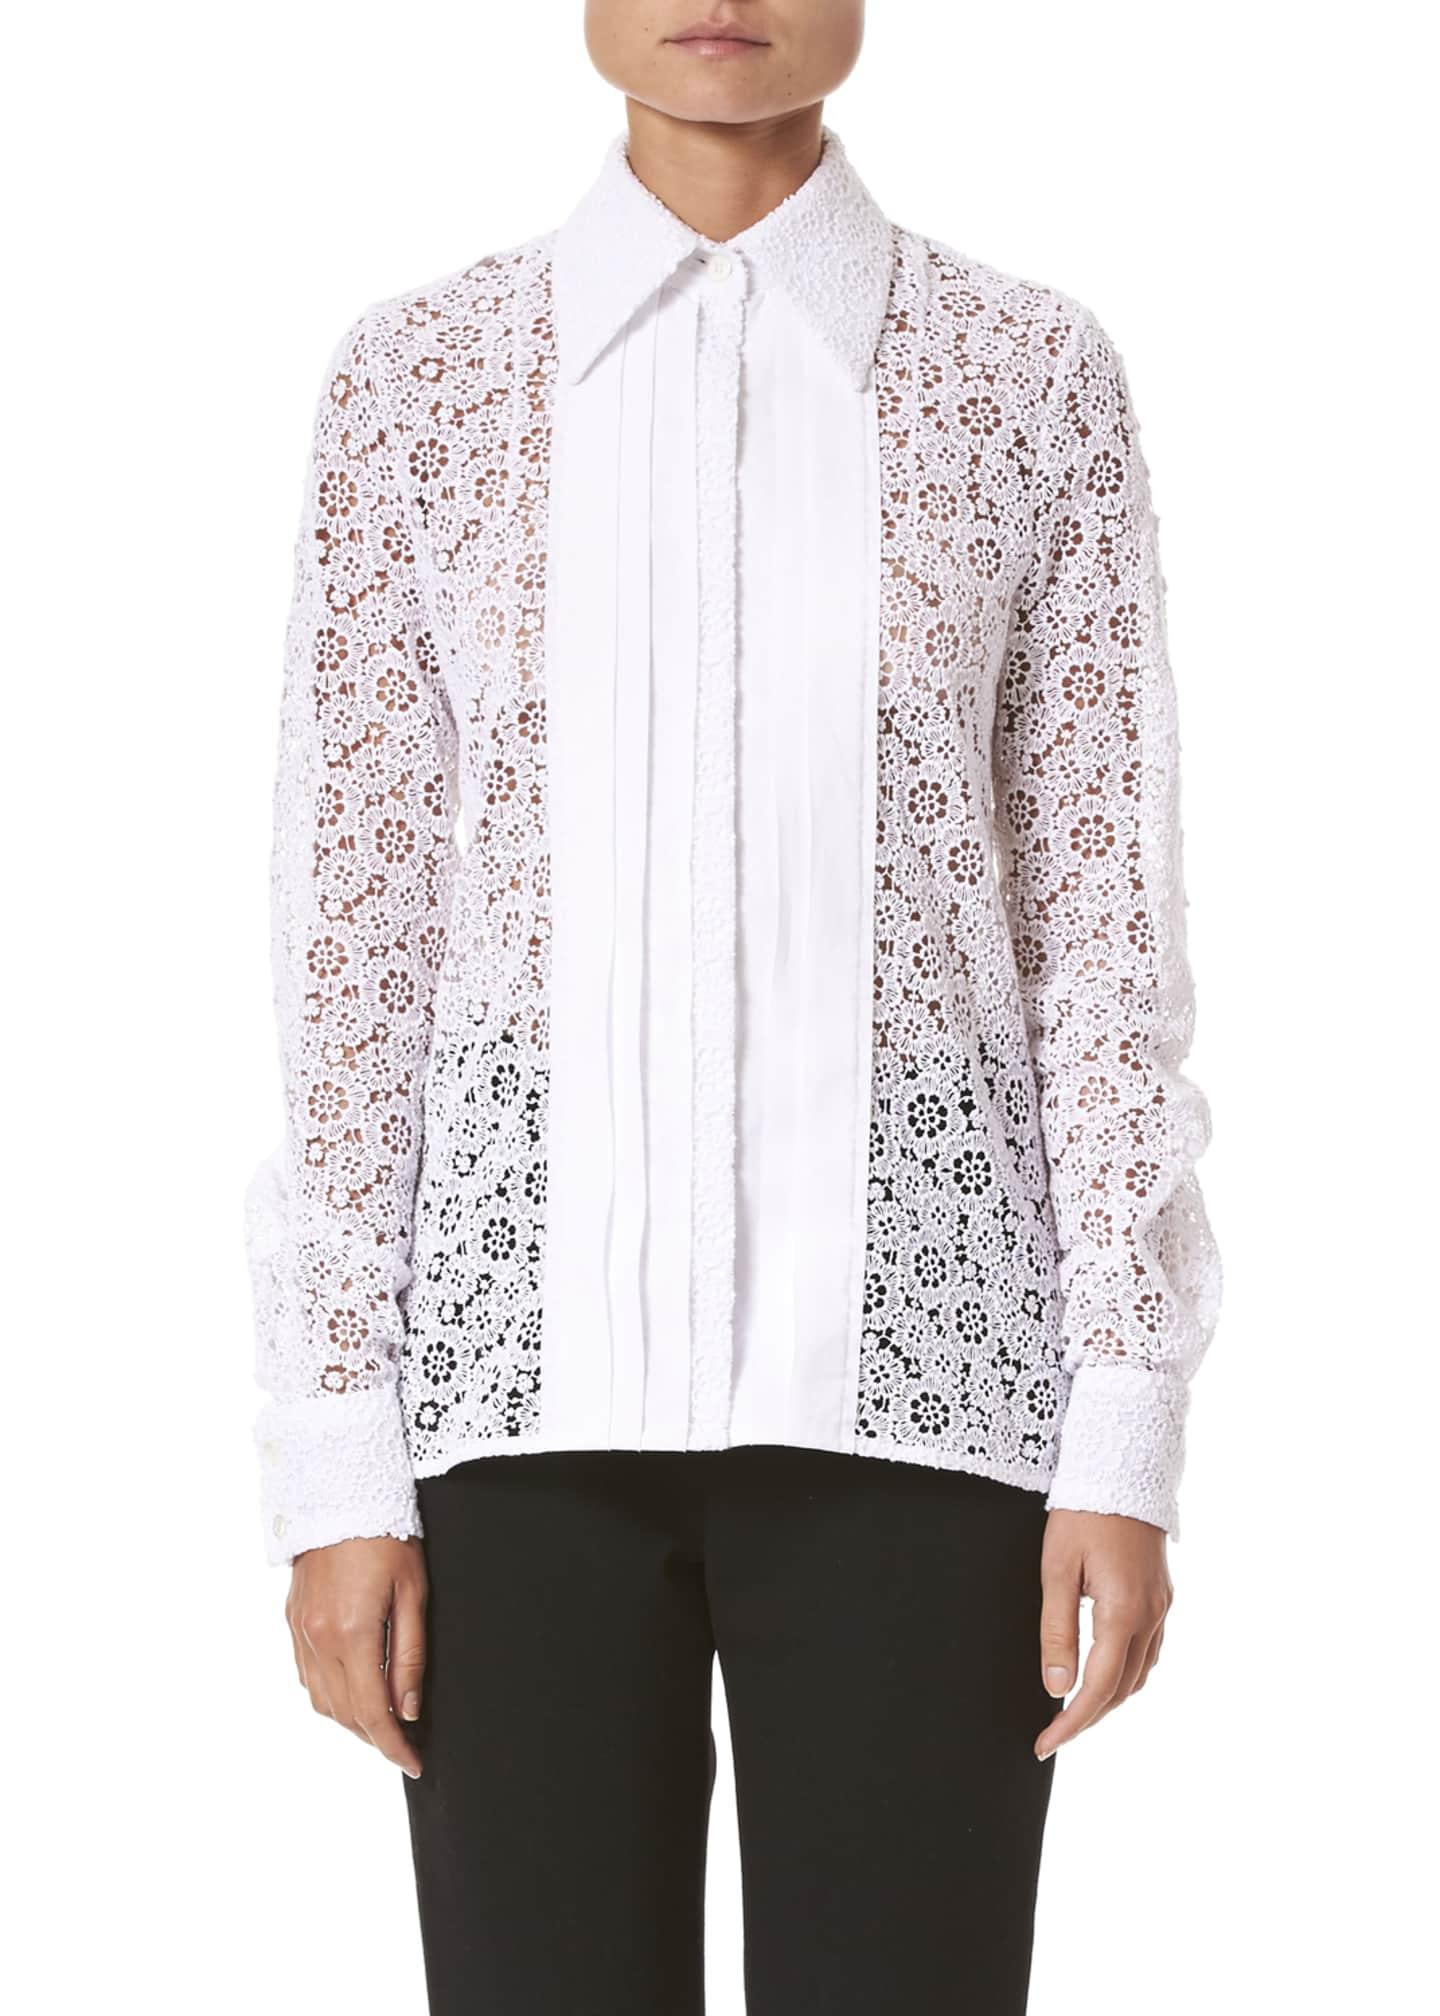 Carolina Herrera Long-Sleeve Eyelet Tuxedo Shirt